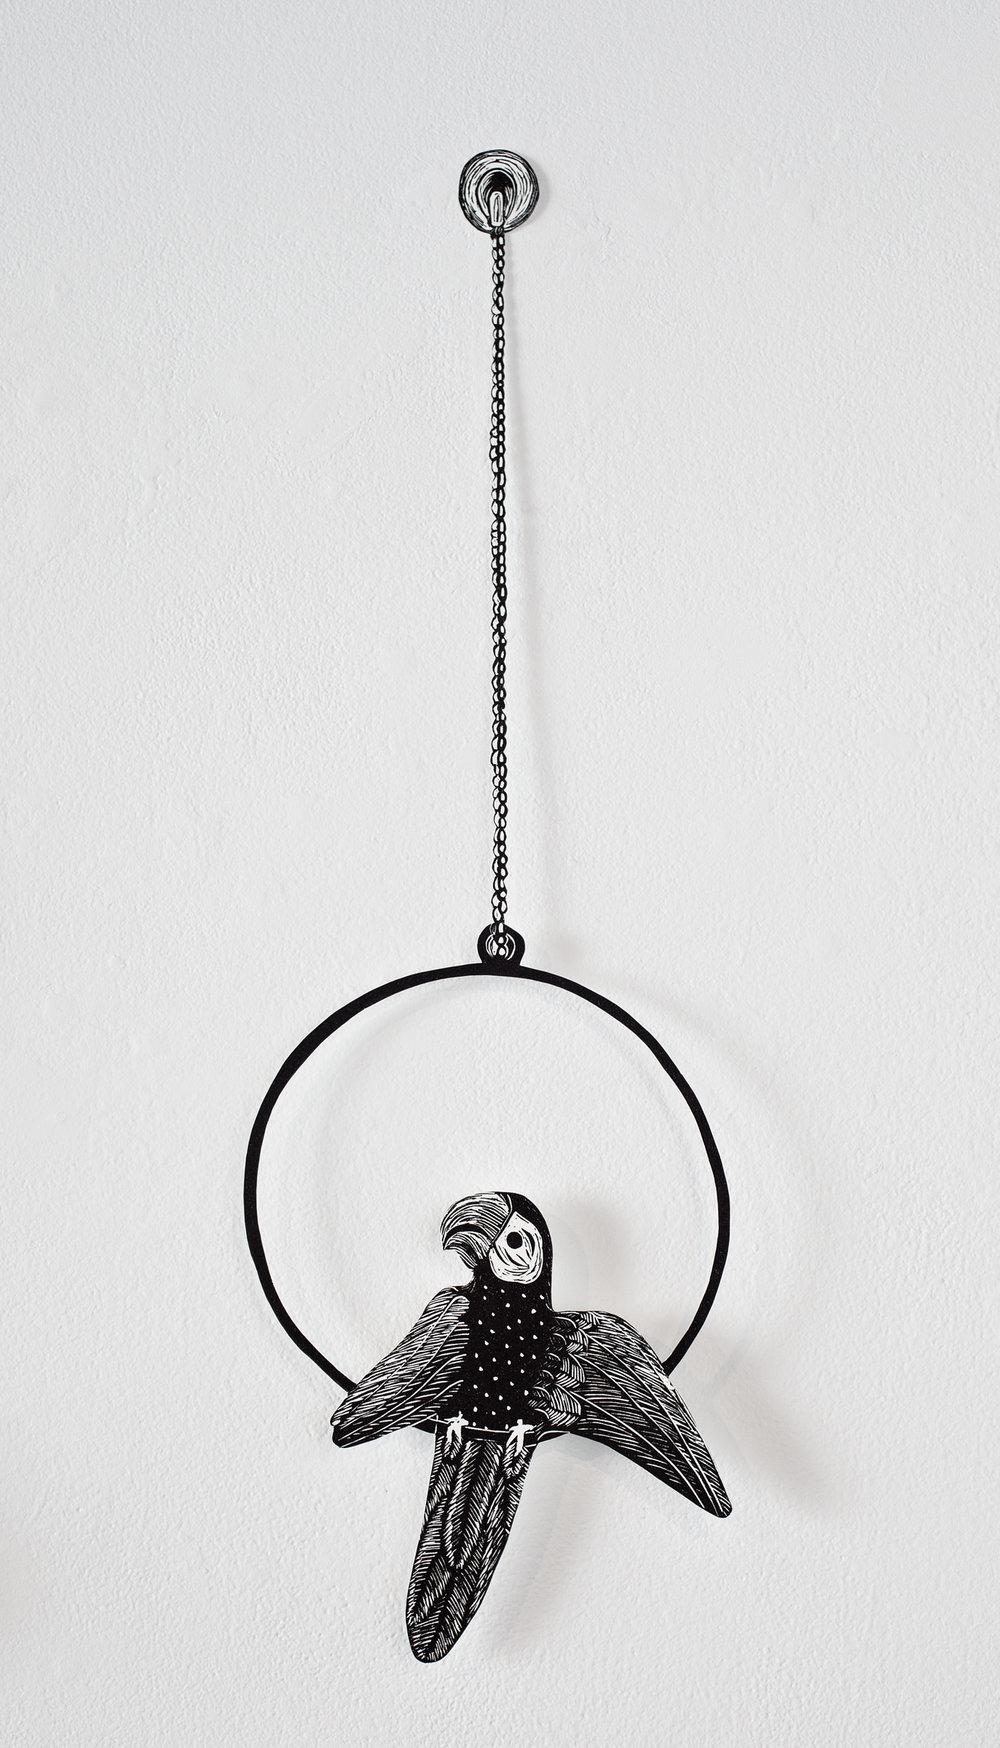 """Parent's Bohemian Honeymoon Parrot"", linoleum relief hand cut out with Xacto, 7 1/2x24"